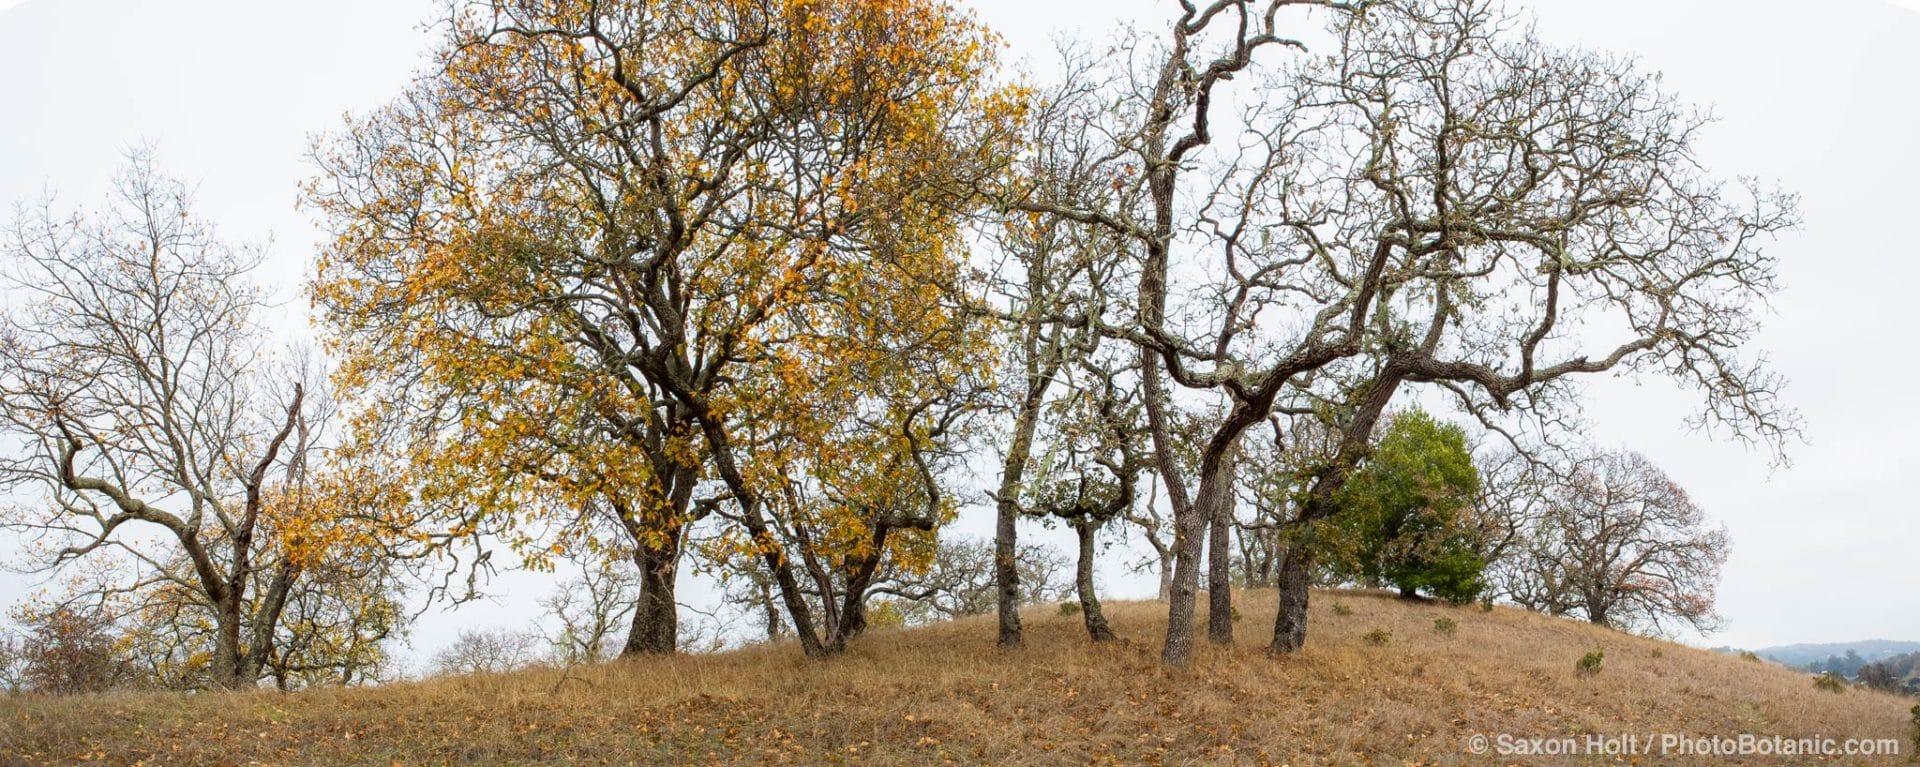 Panorama of Oak trees in autumn on Pinheiro Fire Road, Rush Creek Open Space, Marin County